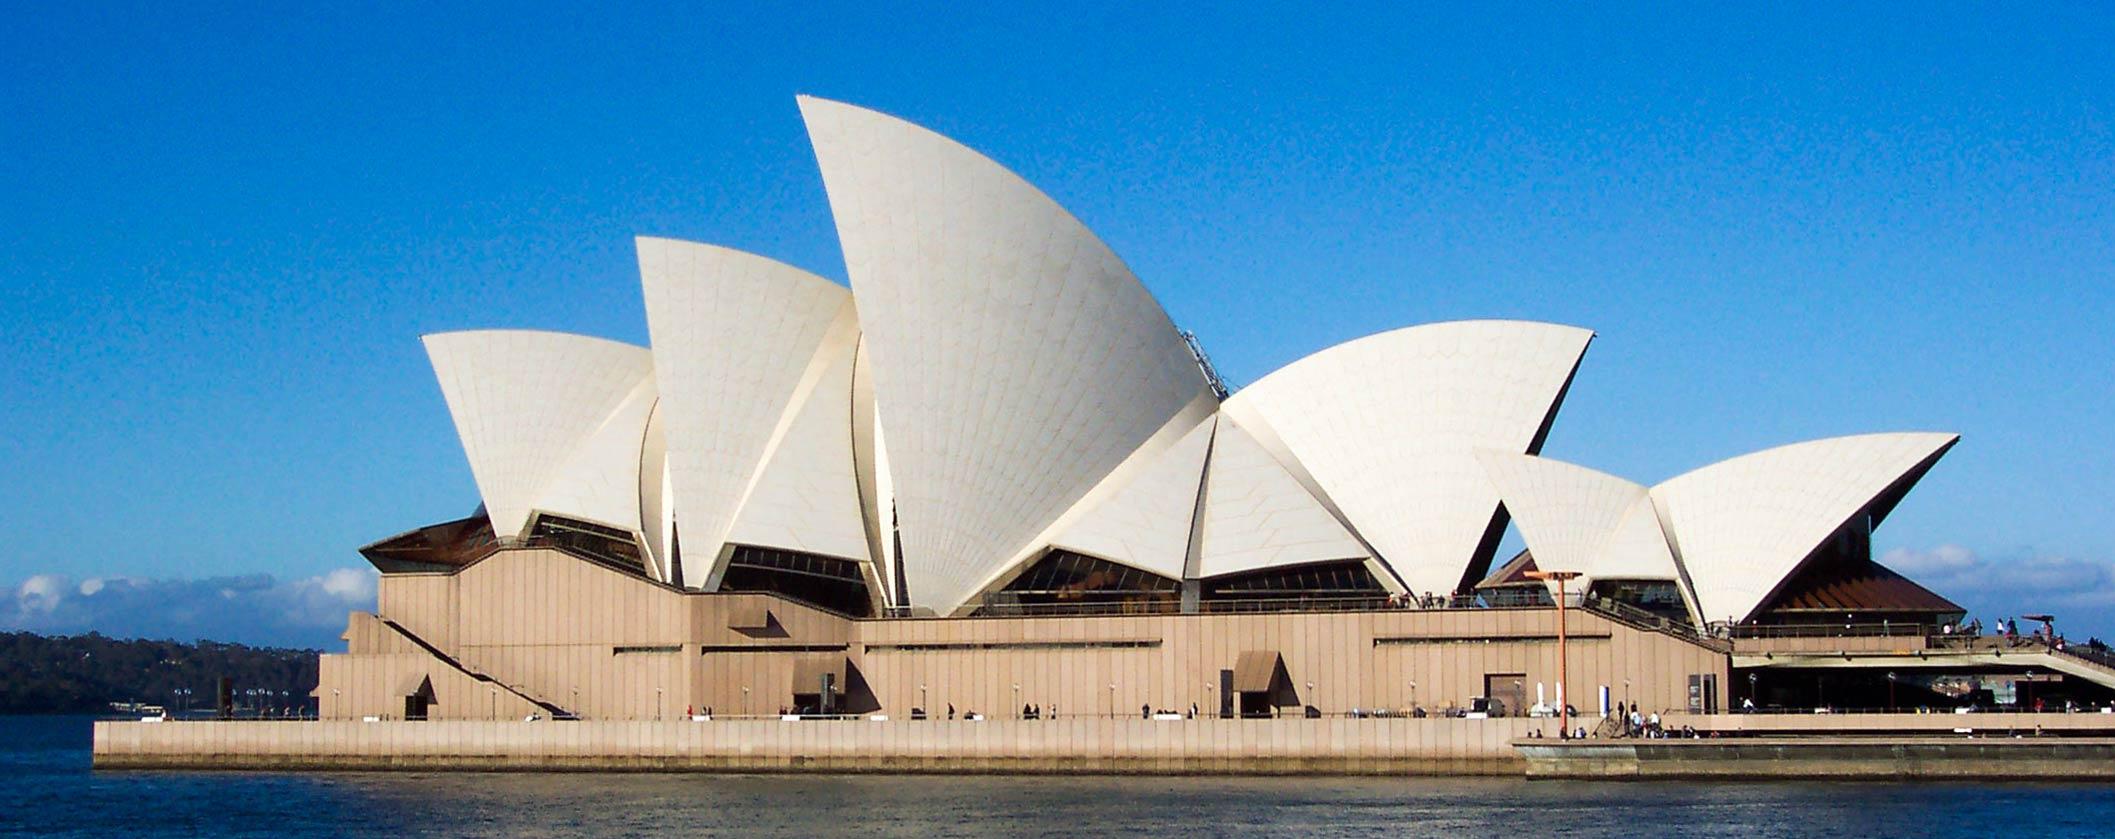 Sydney Opera House Sails DÜNYANIN ÖTEKİ UCU AVUSTRALYA